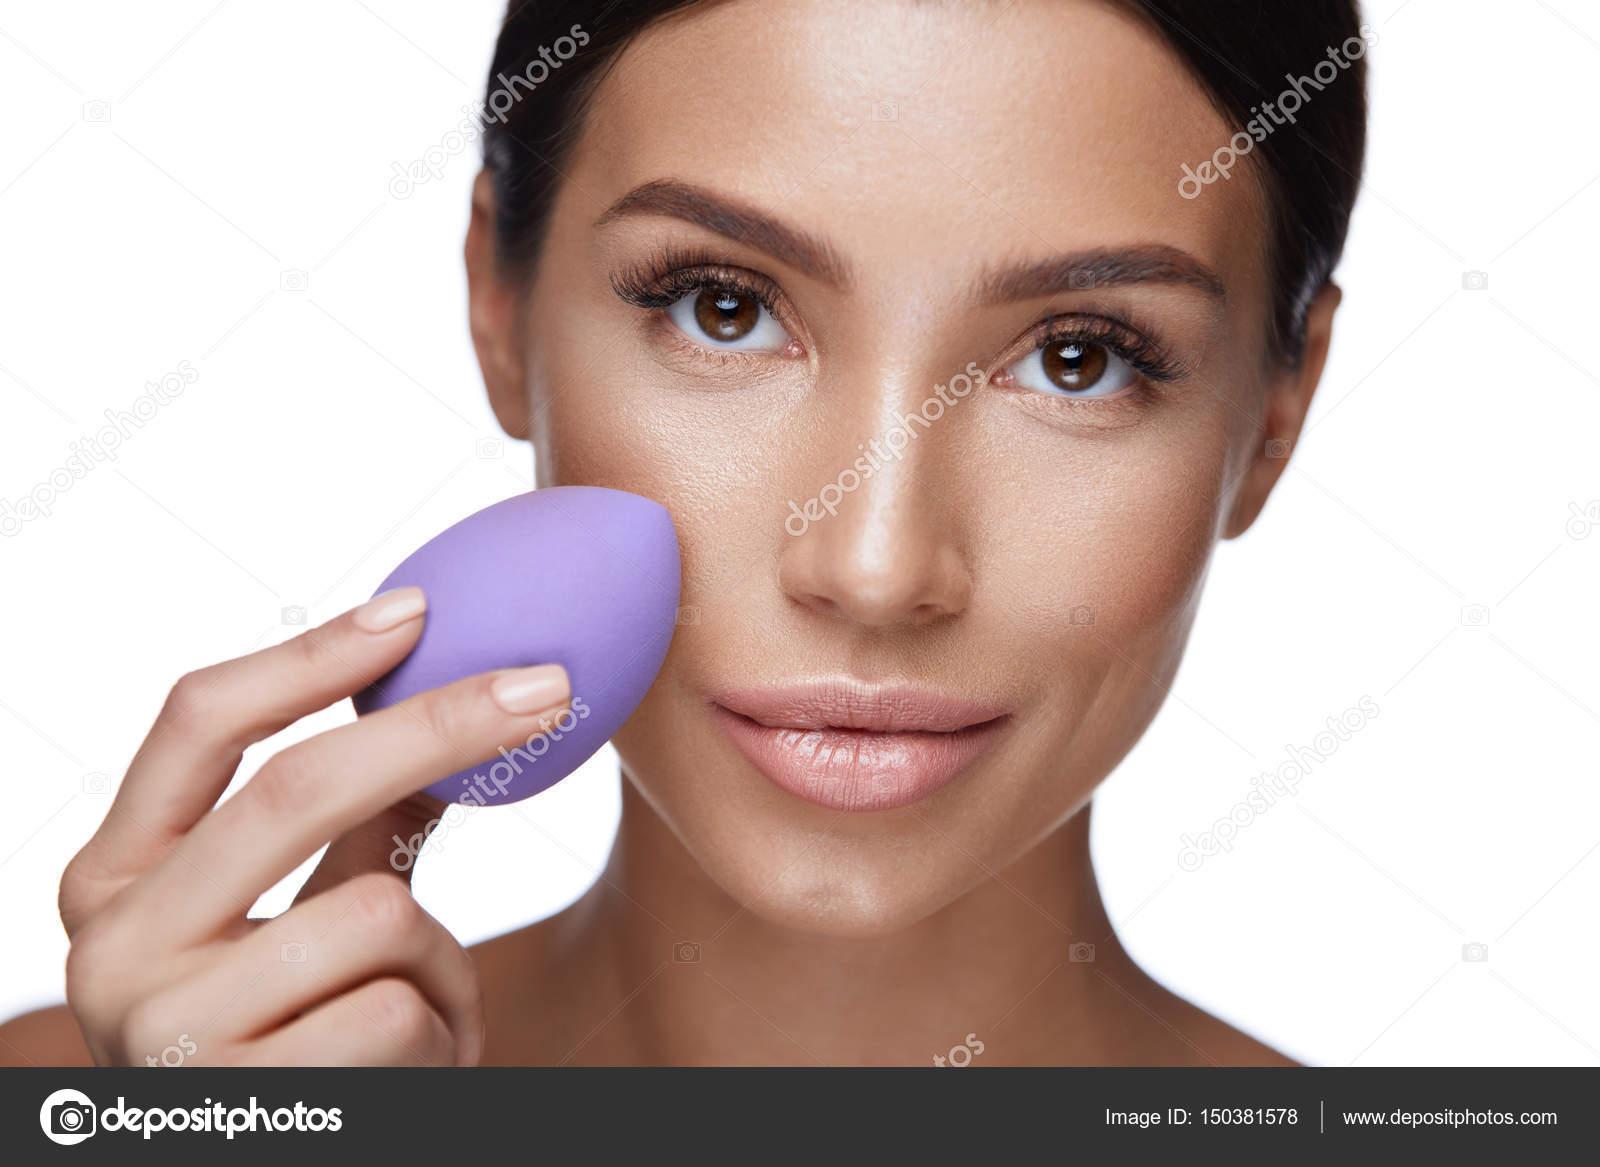 Beauty Makeup Beautiful Woman Applying Foundation With Sponge Stock Photo C Puhhha 150381578